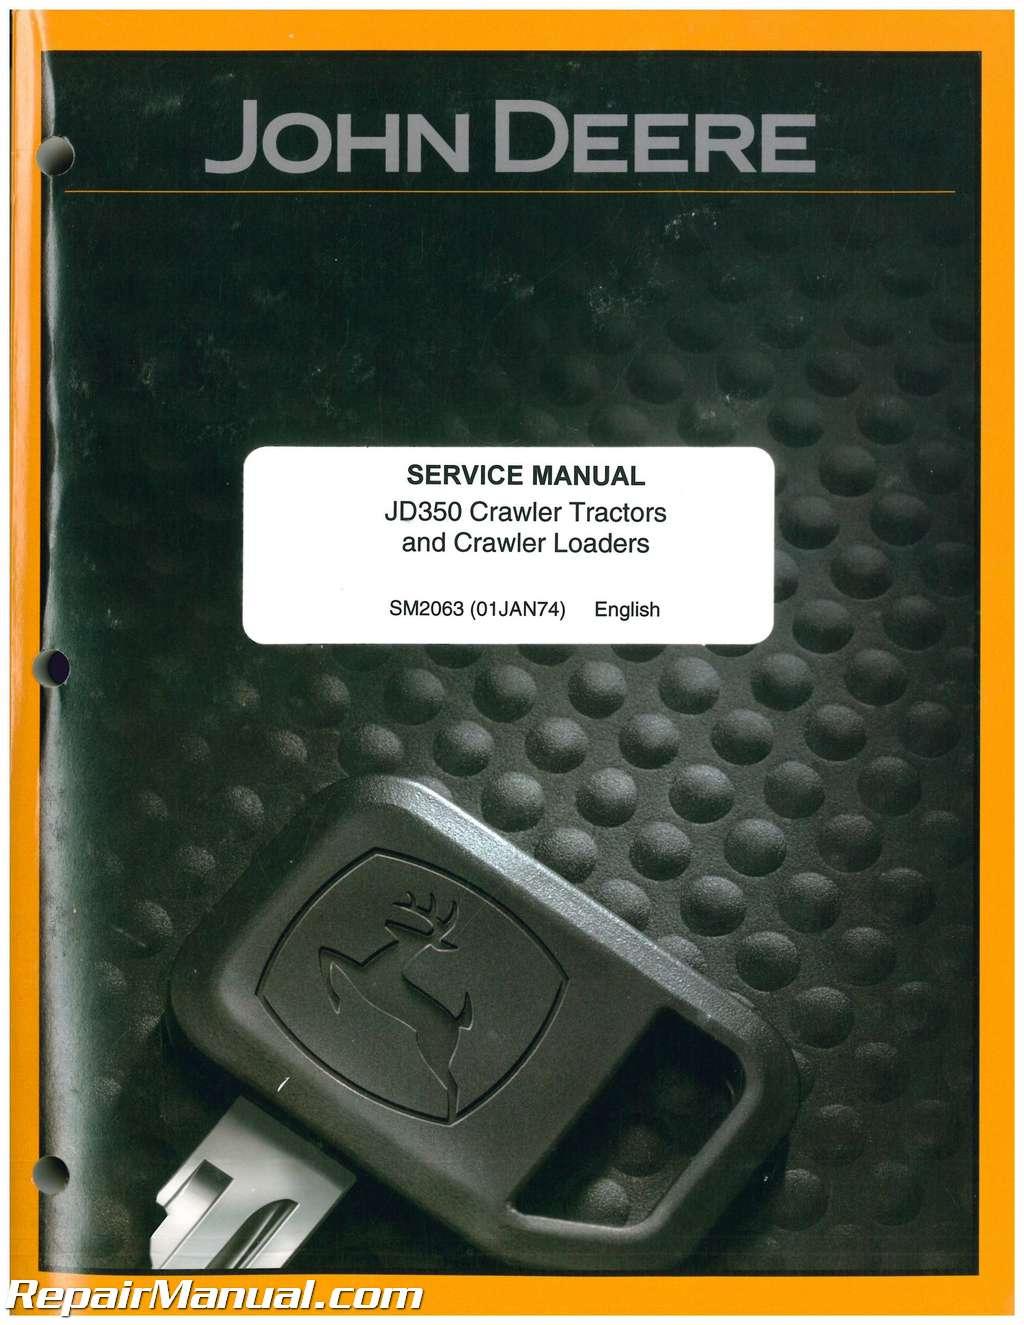 John Deere For Sale >> John Deere 350 Service Manual